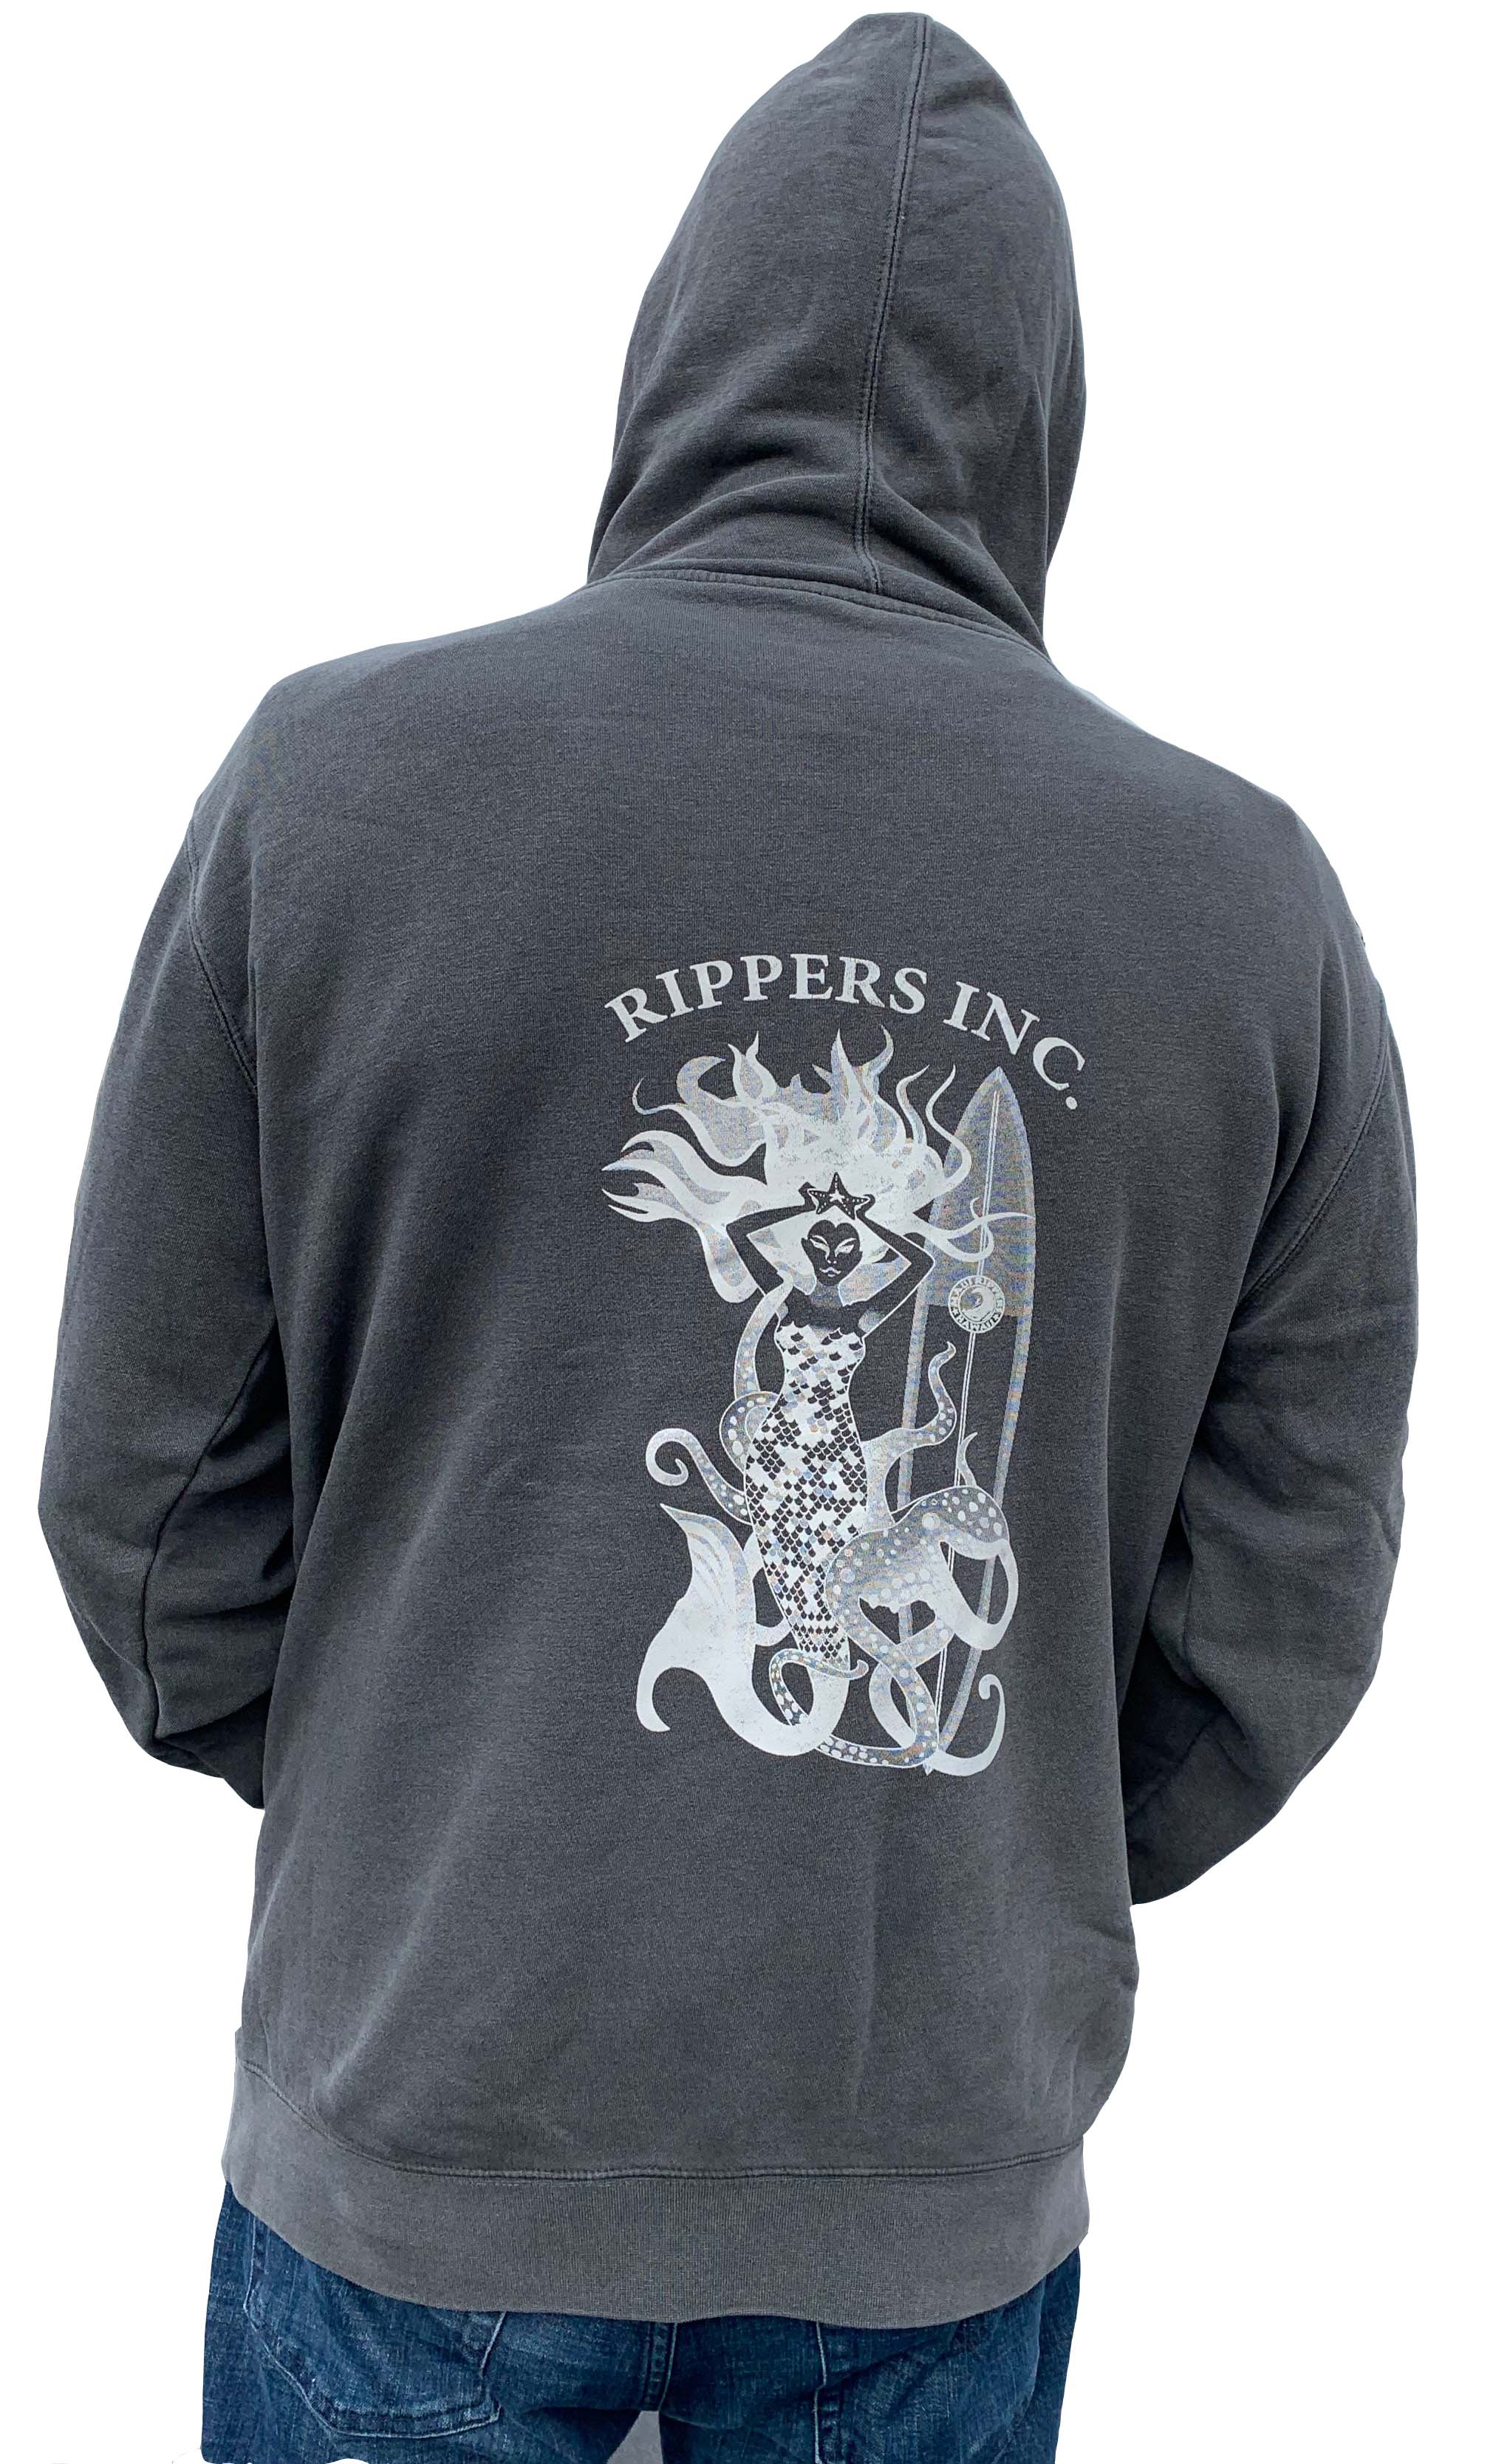 rippersinc-hoody-charcoal.jpg